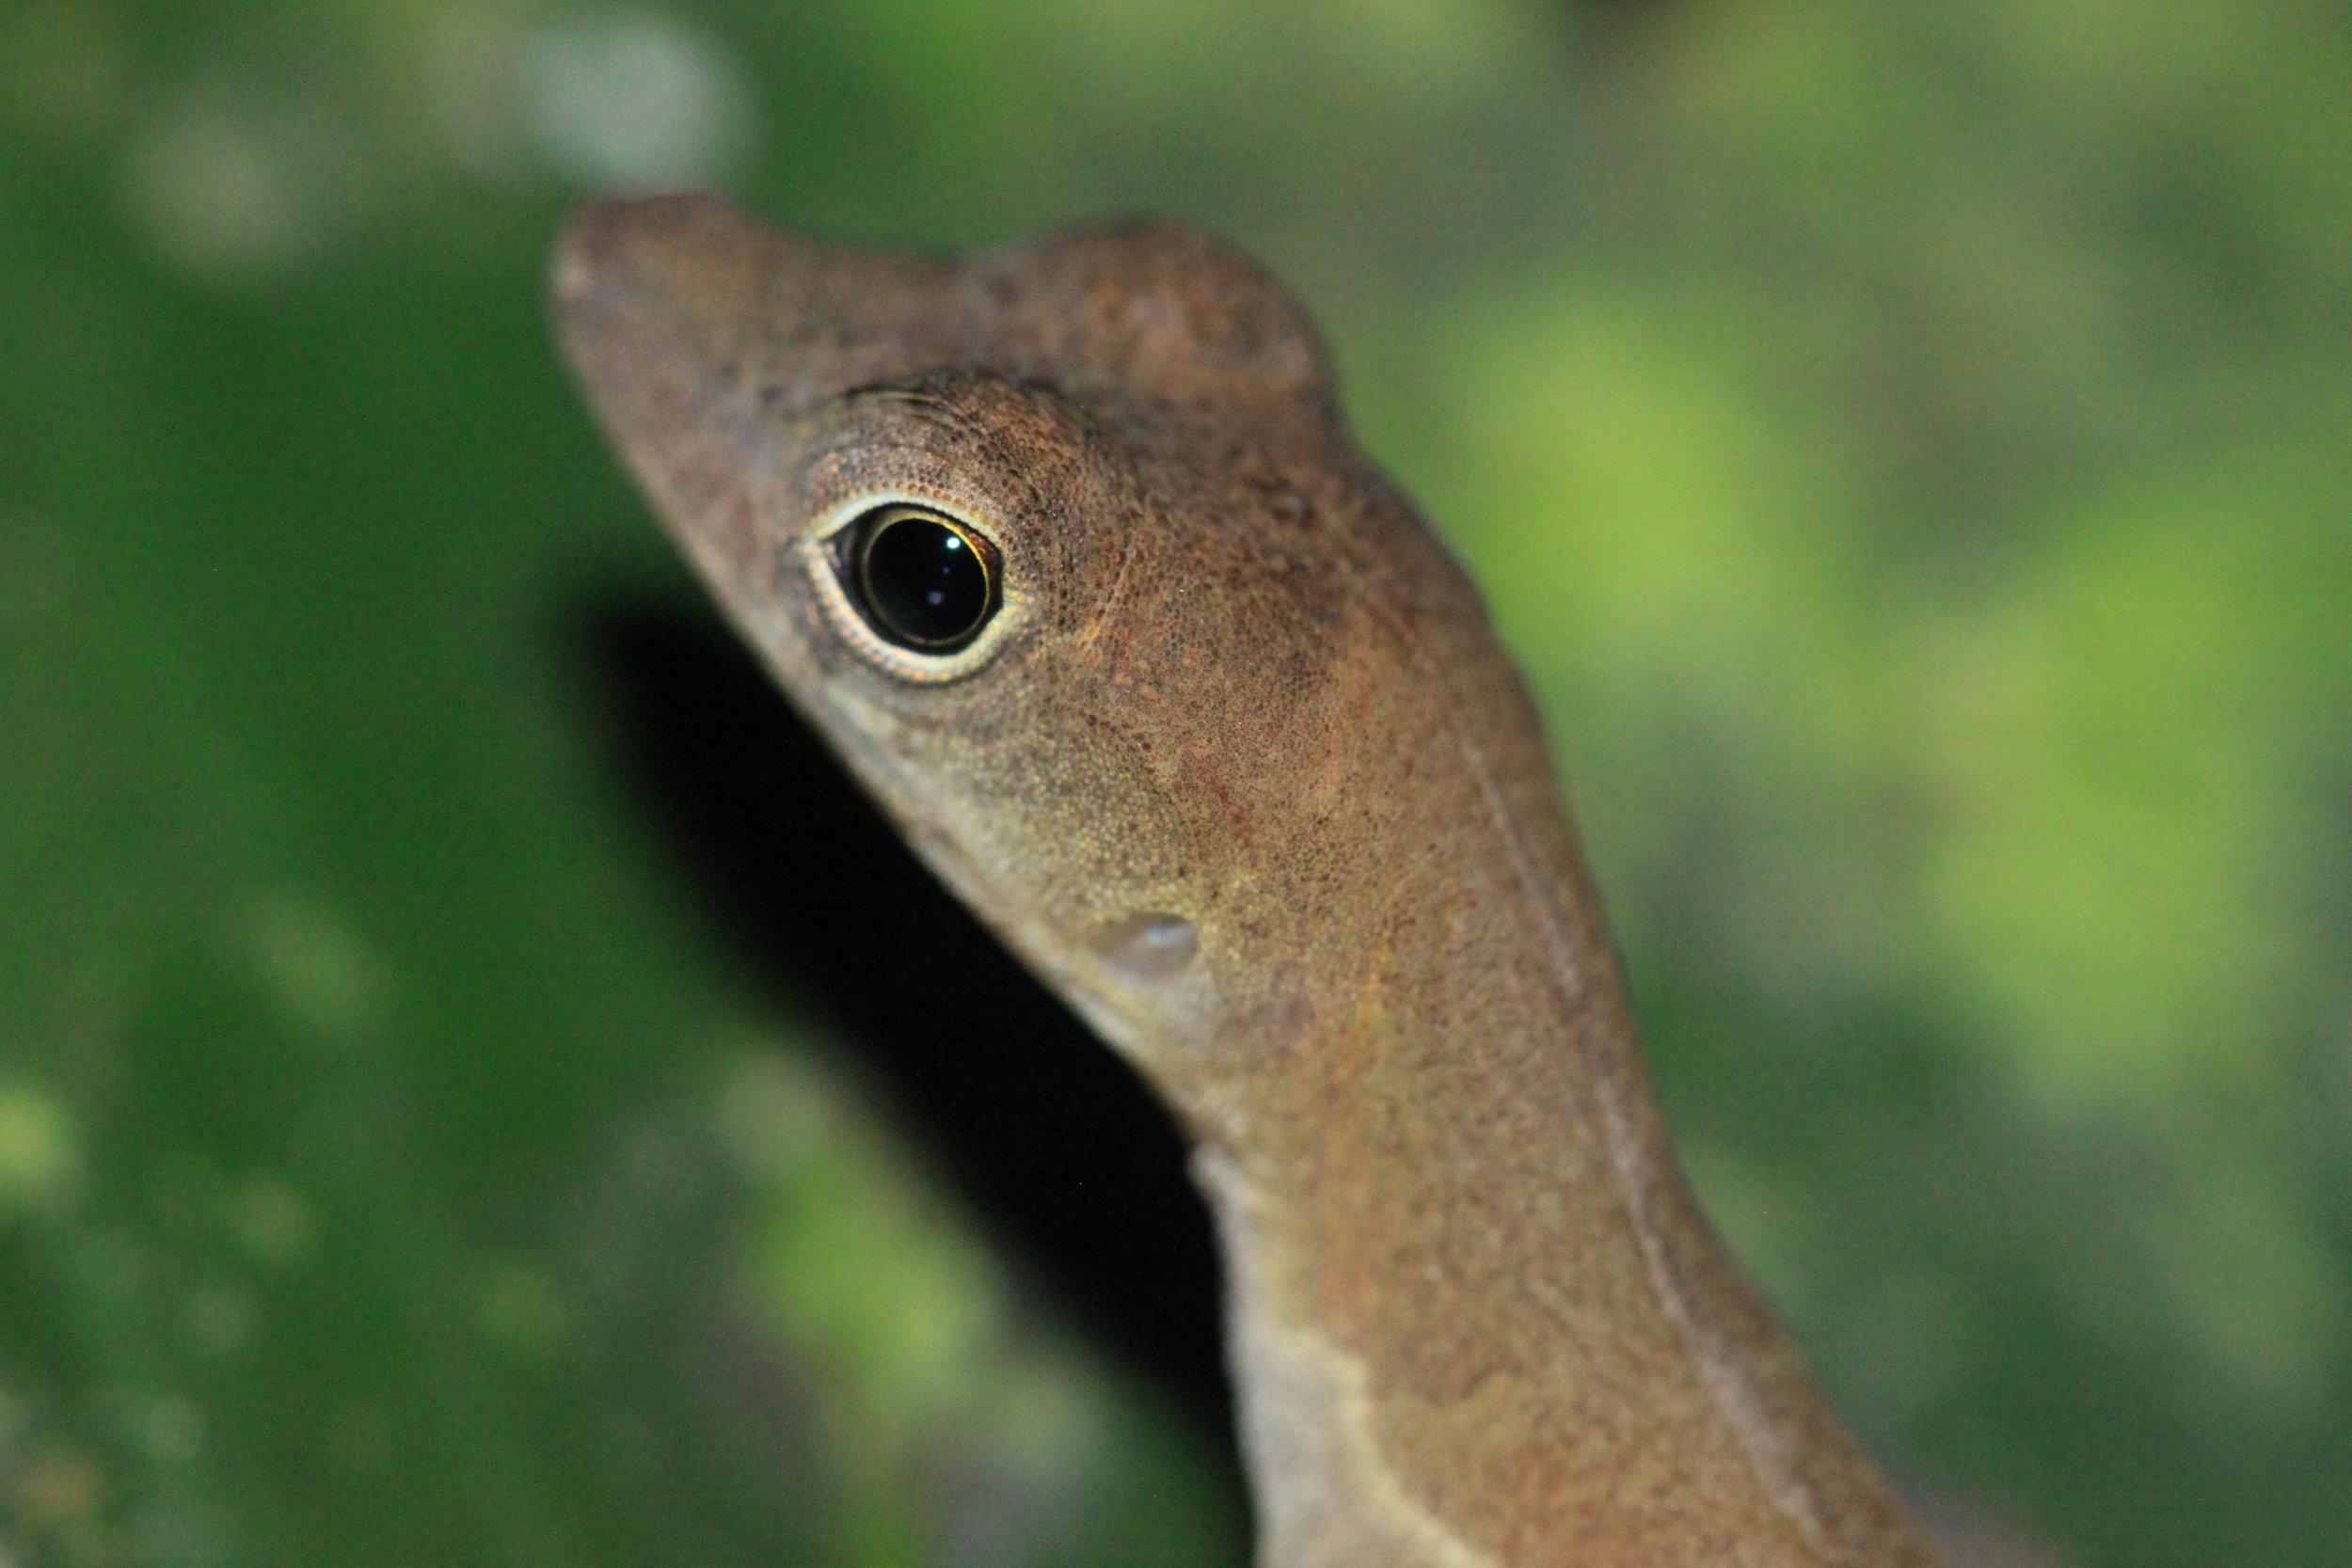 House gecko ( Hemidactylus frenatus ) on alert.